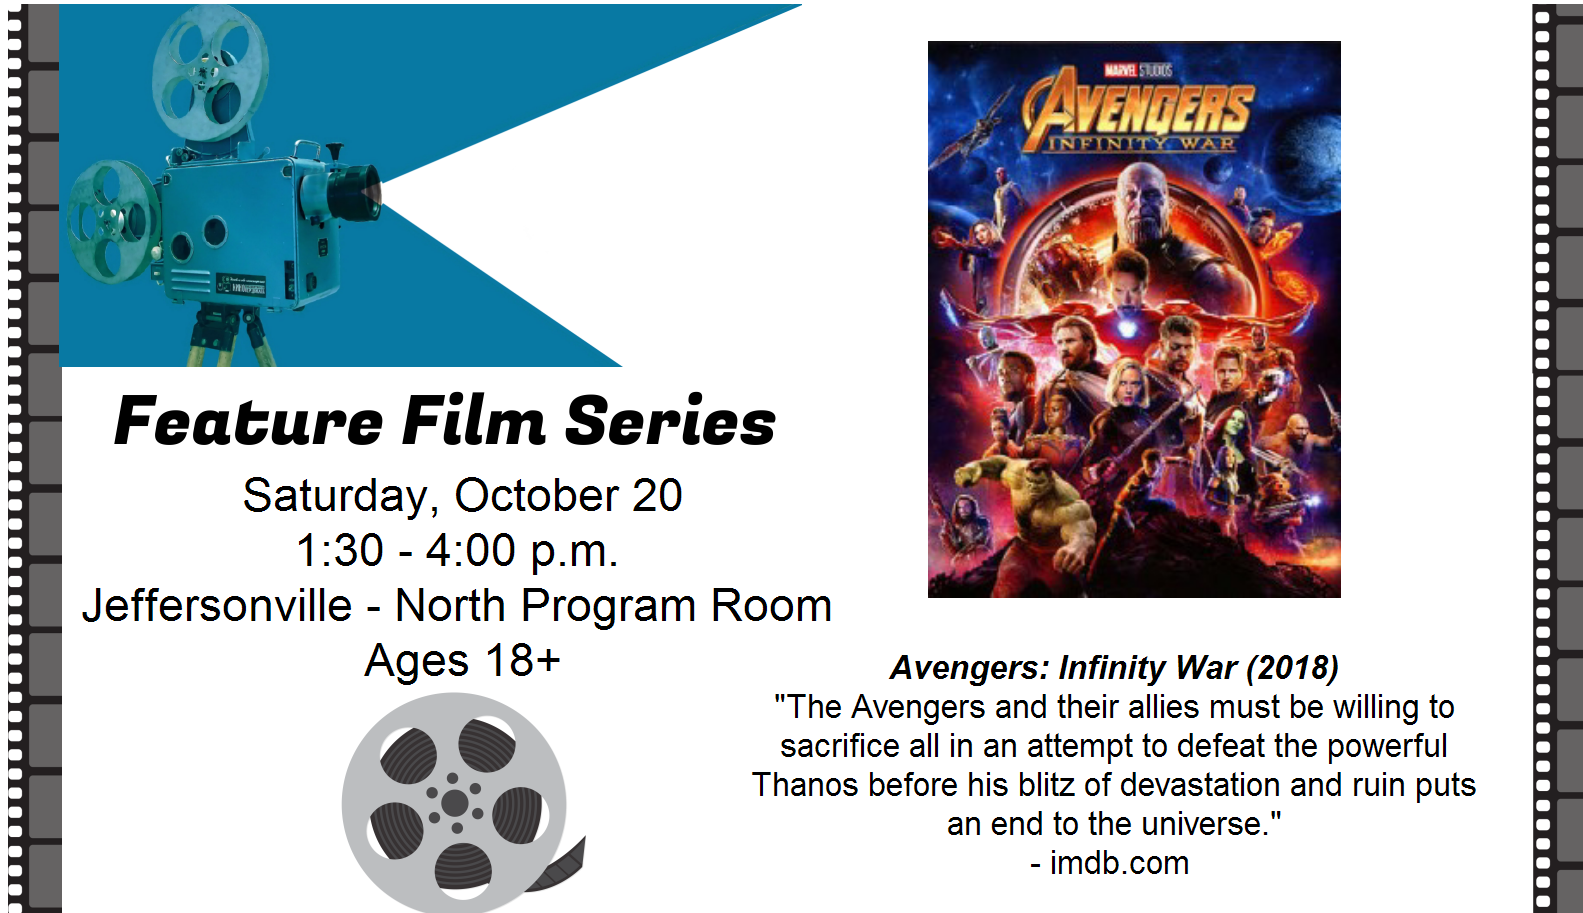 Feature Film Series – Avengers: Infinity War